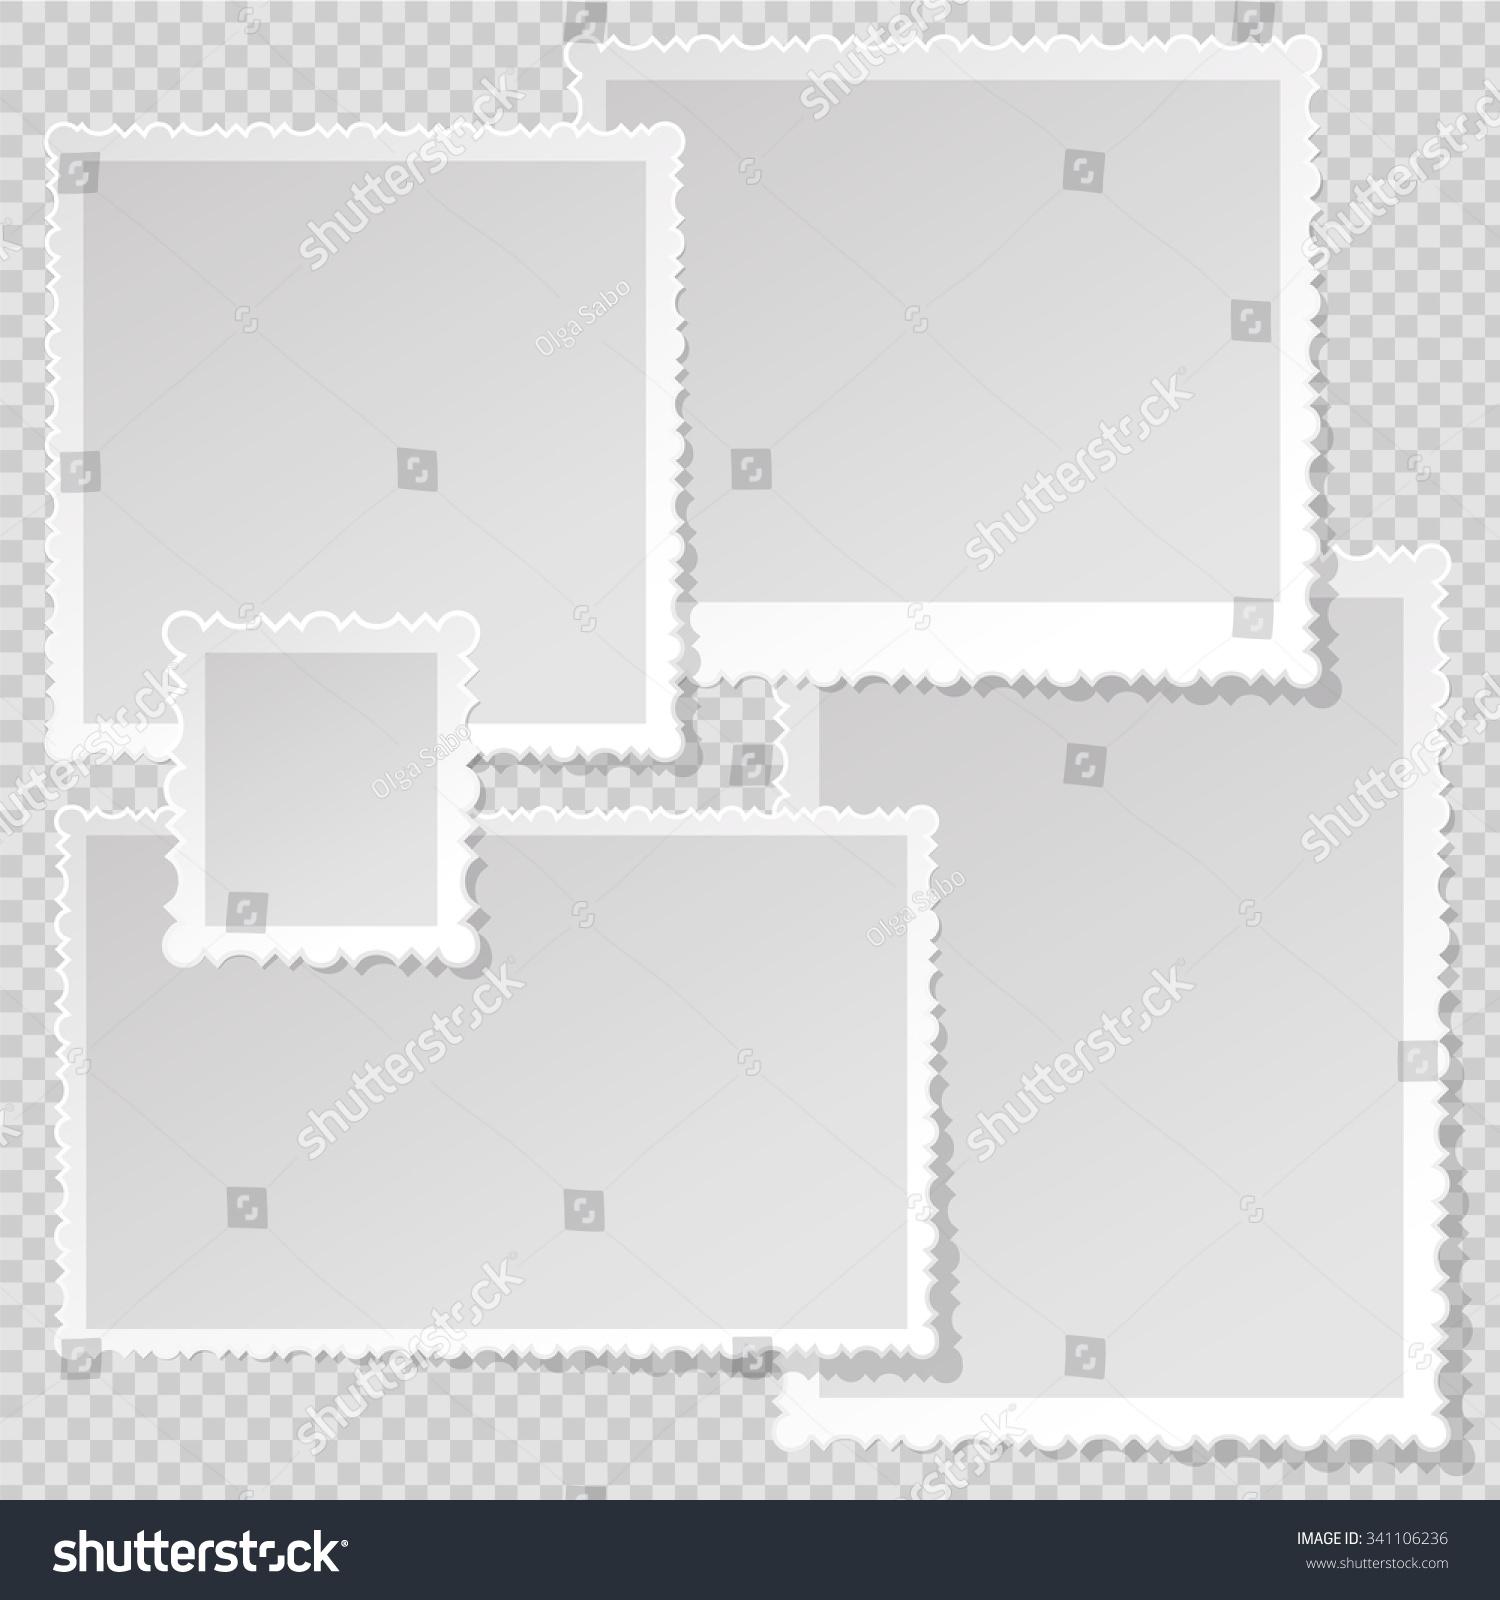 Photo Frame Template Sharp Transparent Shadow Stock Photo (Photo ...